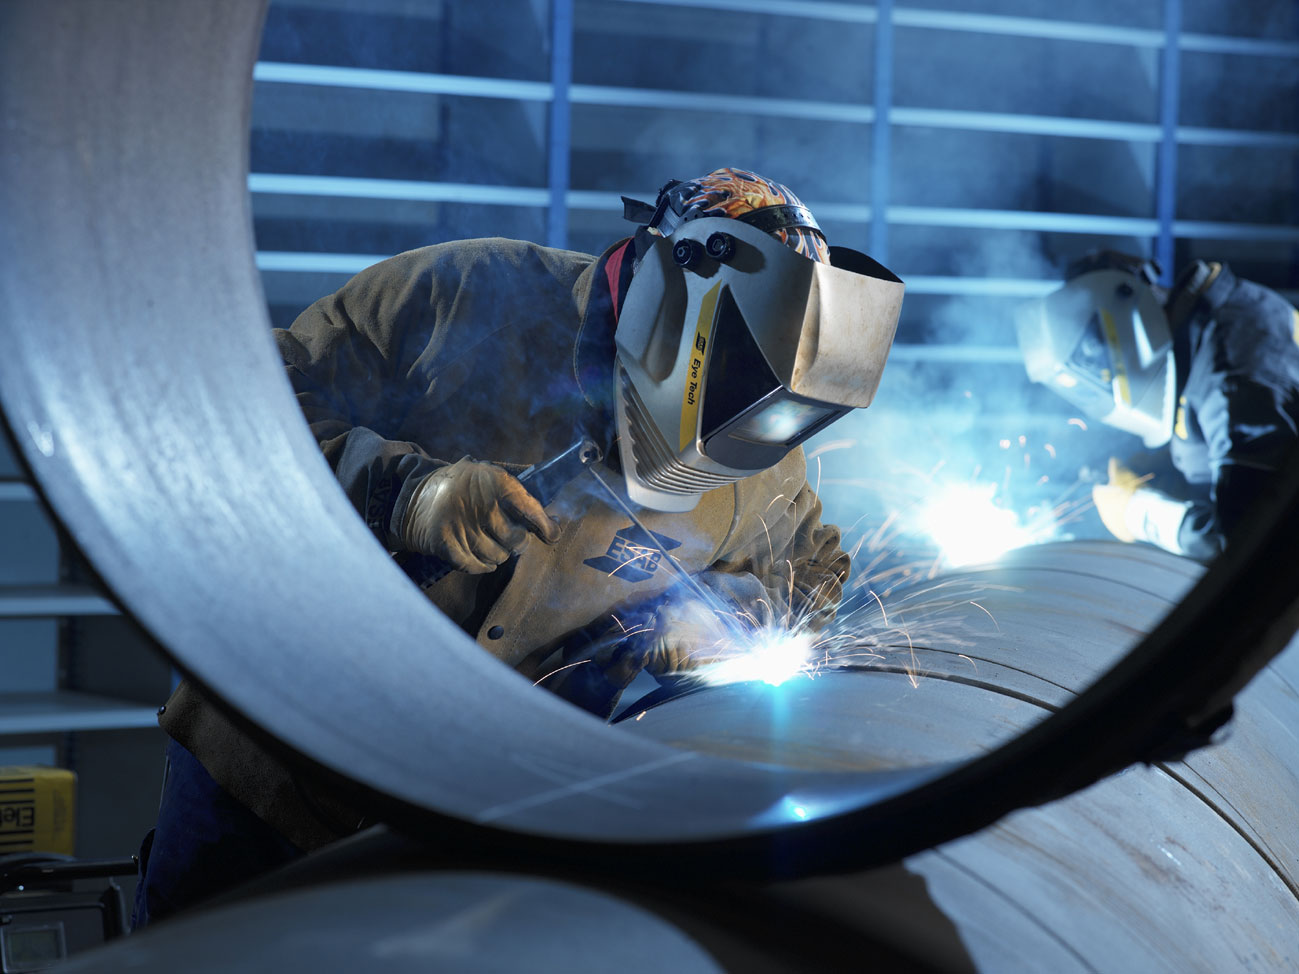 878_901172_MMA_welding_big